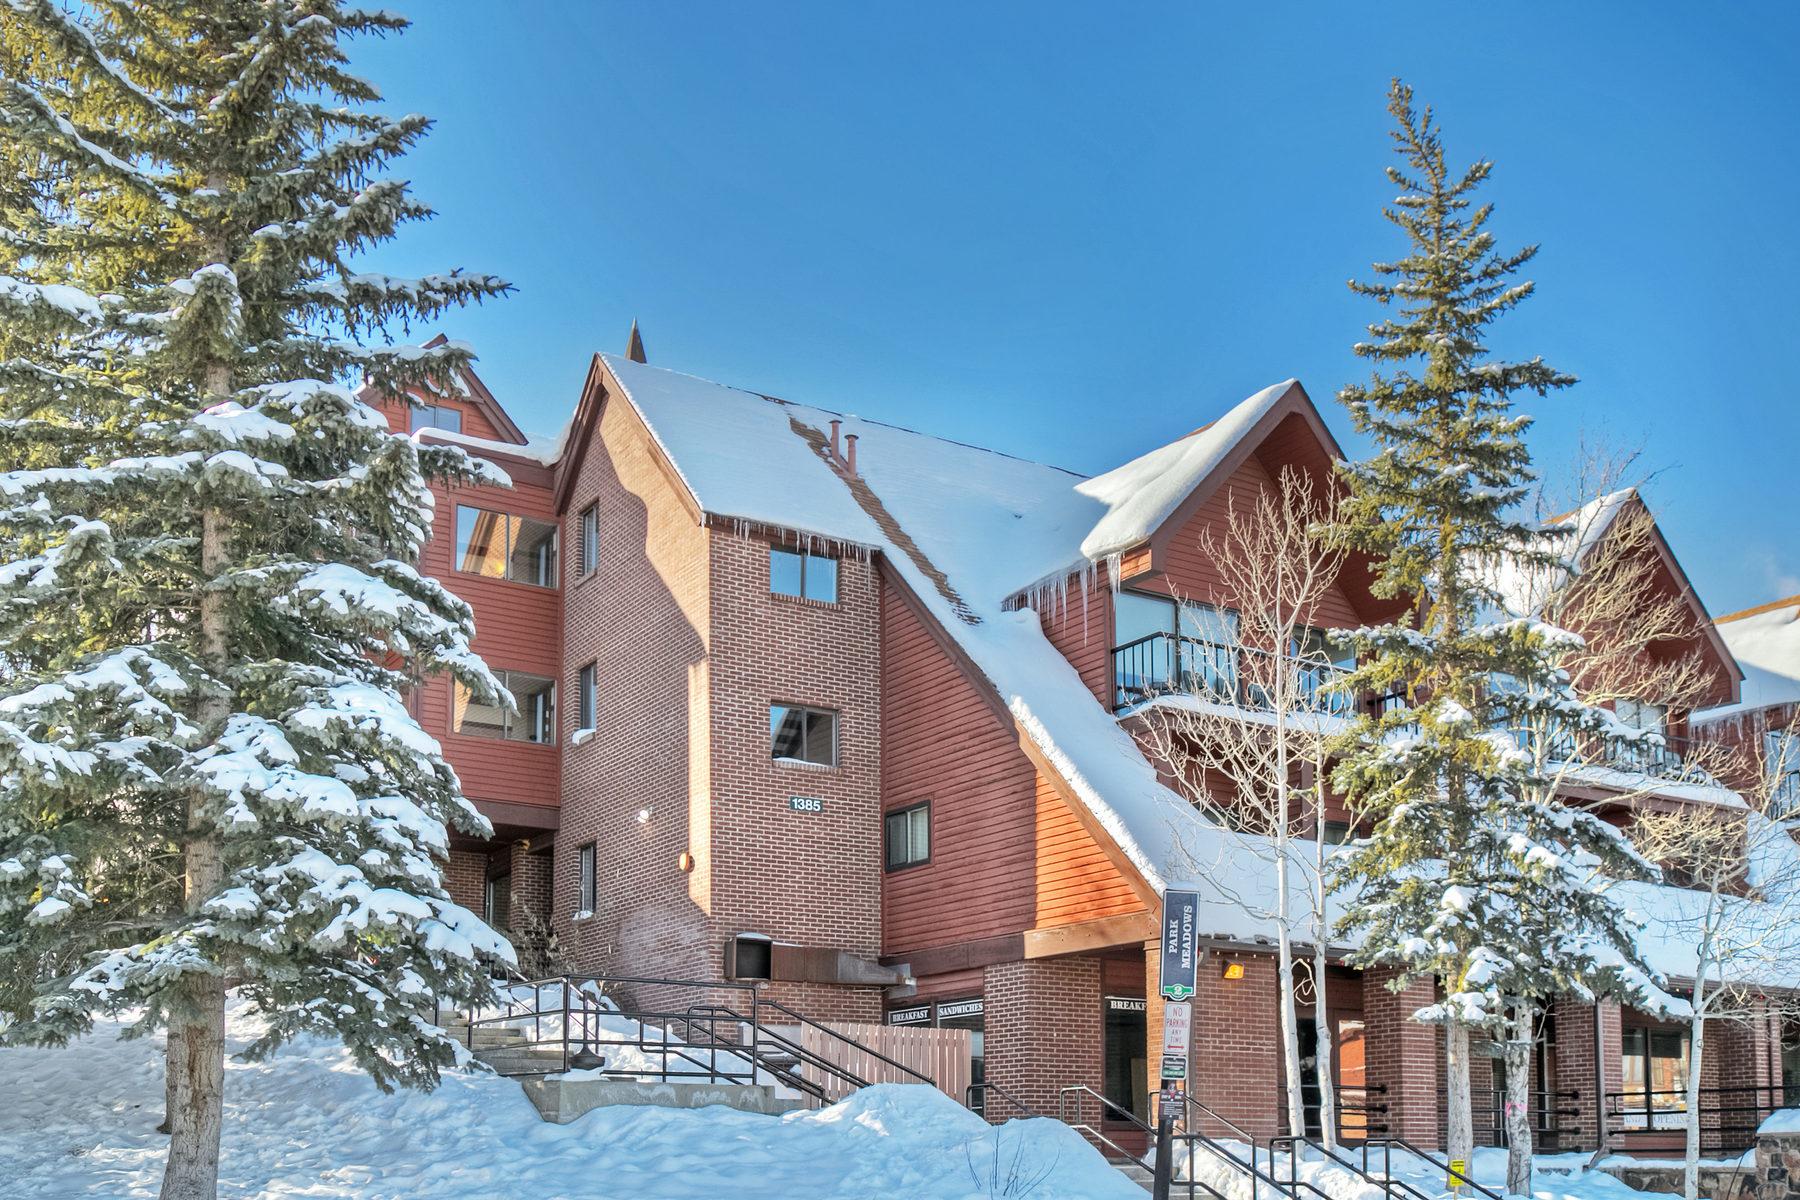 共管式独立产权公寓 为 销售 在 Ski-in Ski-out at the Base of Park City Mountain 1385 Lowell Ave #201 帕克城, 犹他州 84060 美国